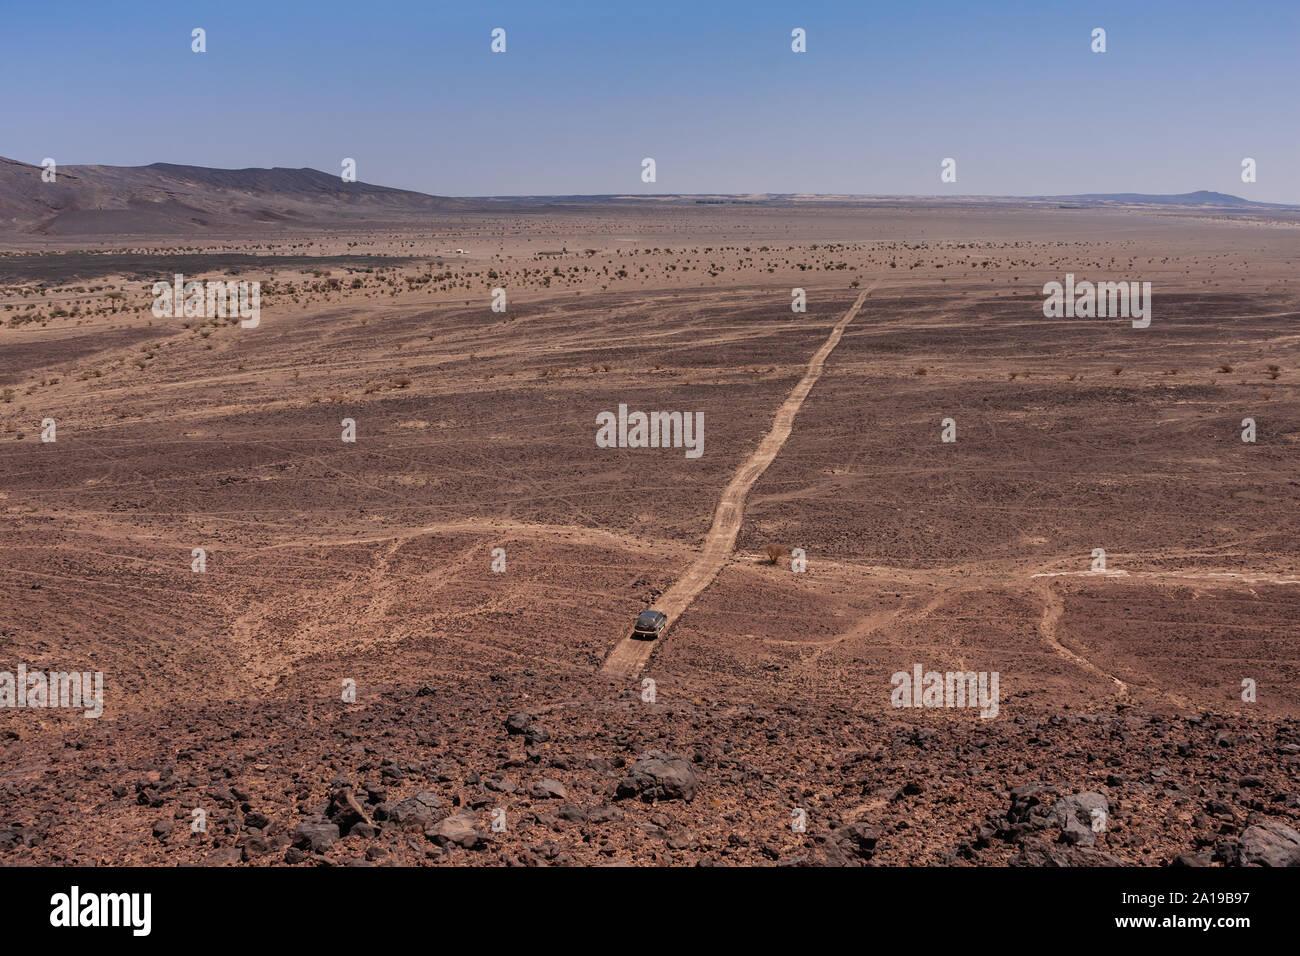 An Aerial View Of A Lonely Suv On The Harrat Kishb Volcanic Field Makkah Province Saudi Arabia Stock Photo Alamy